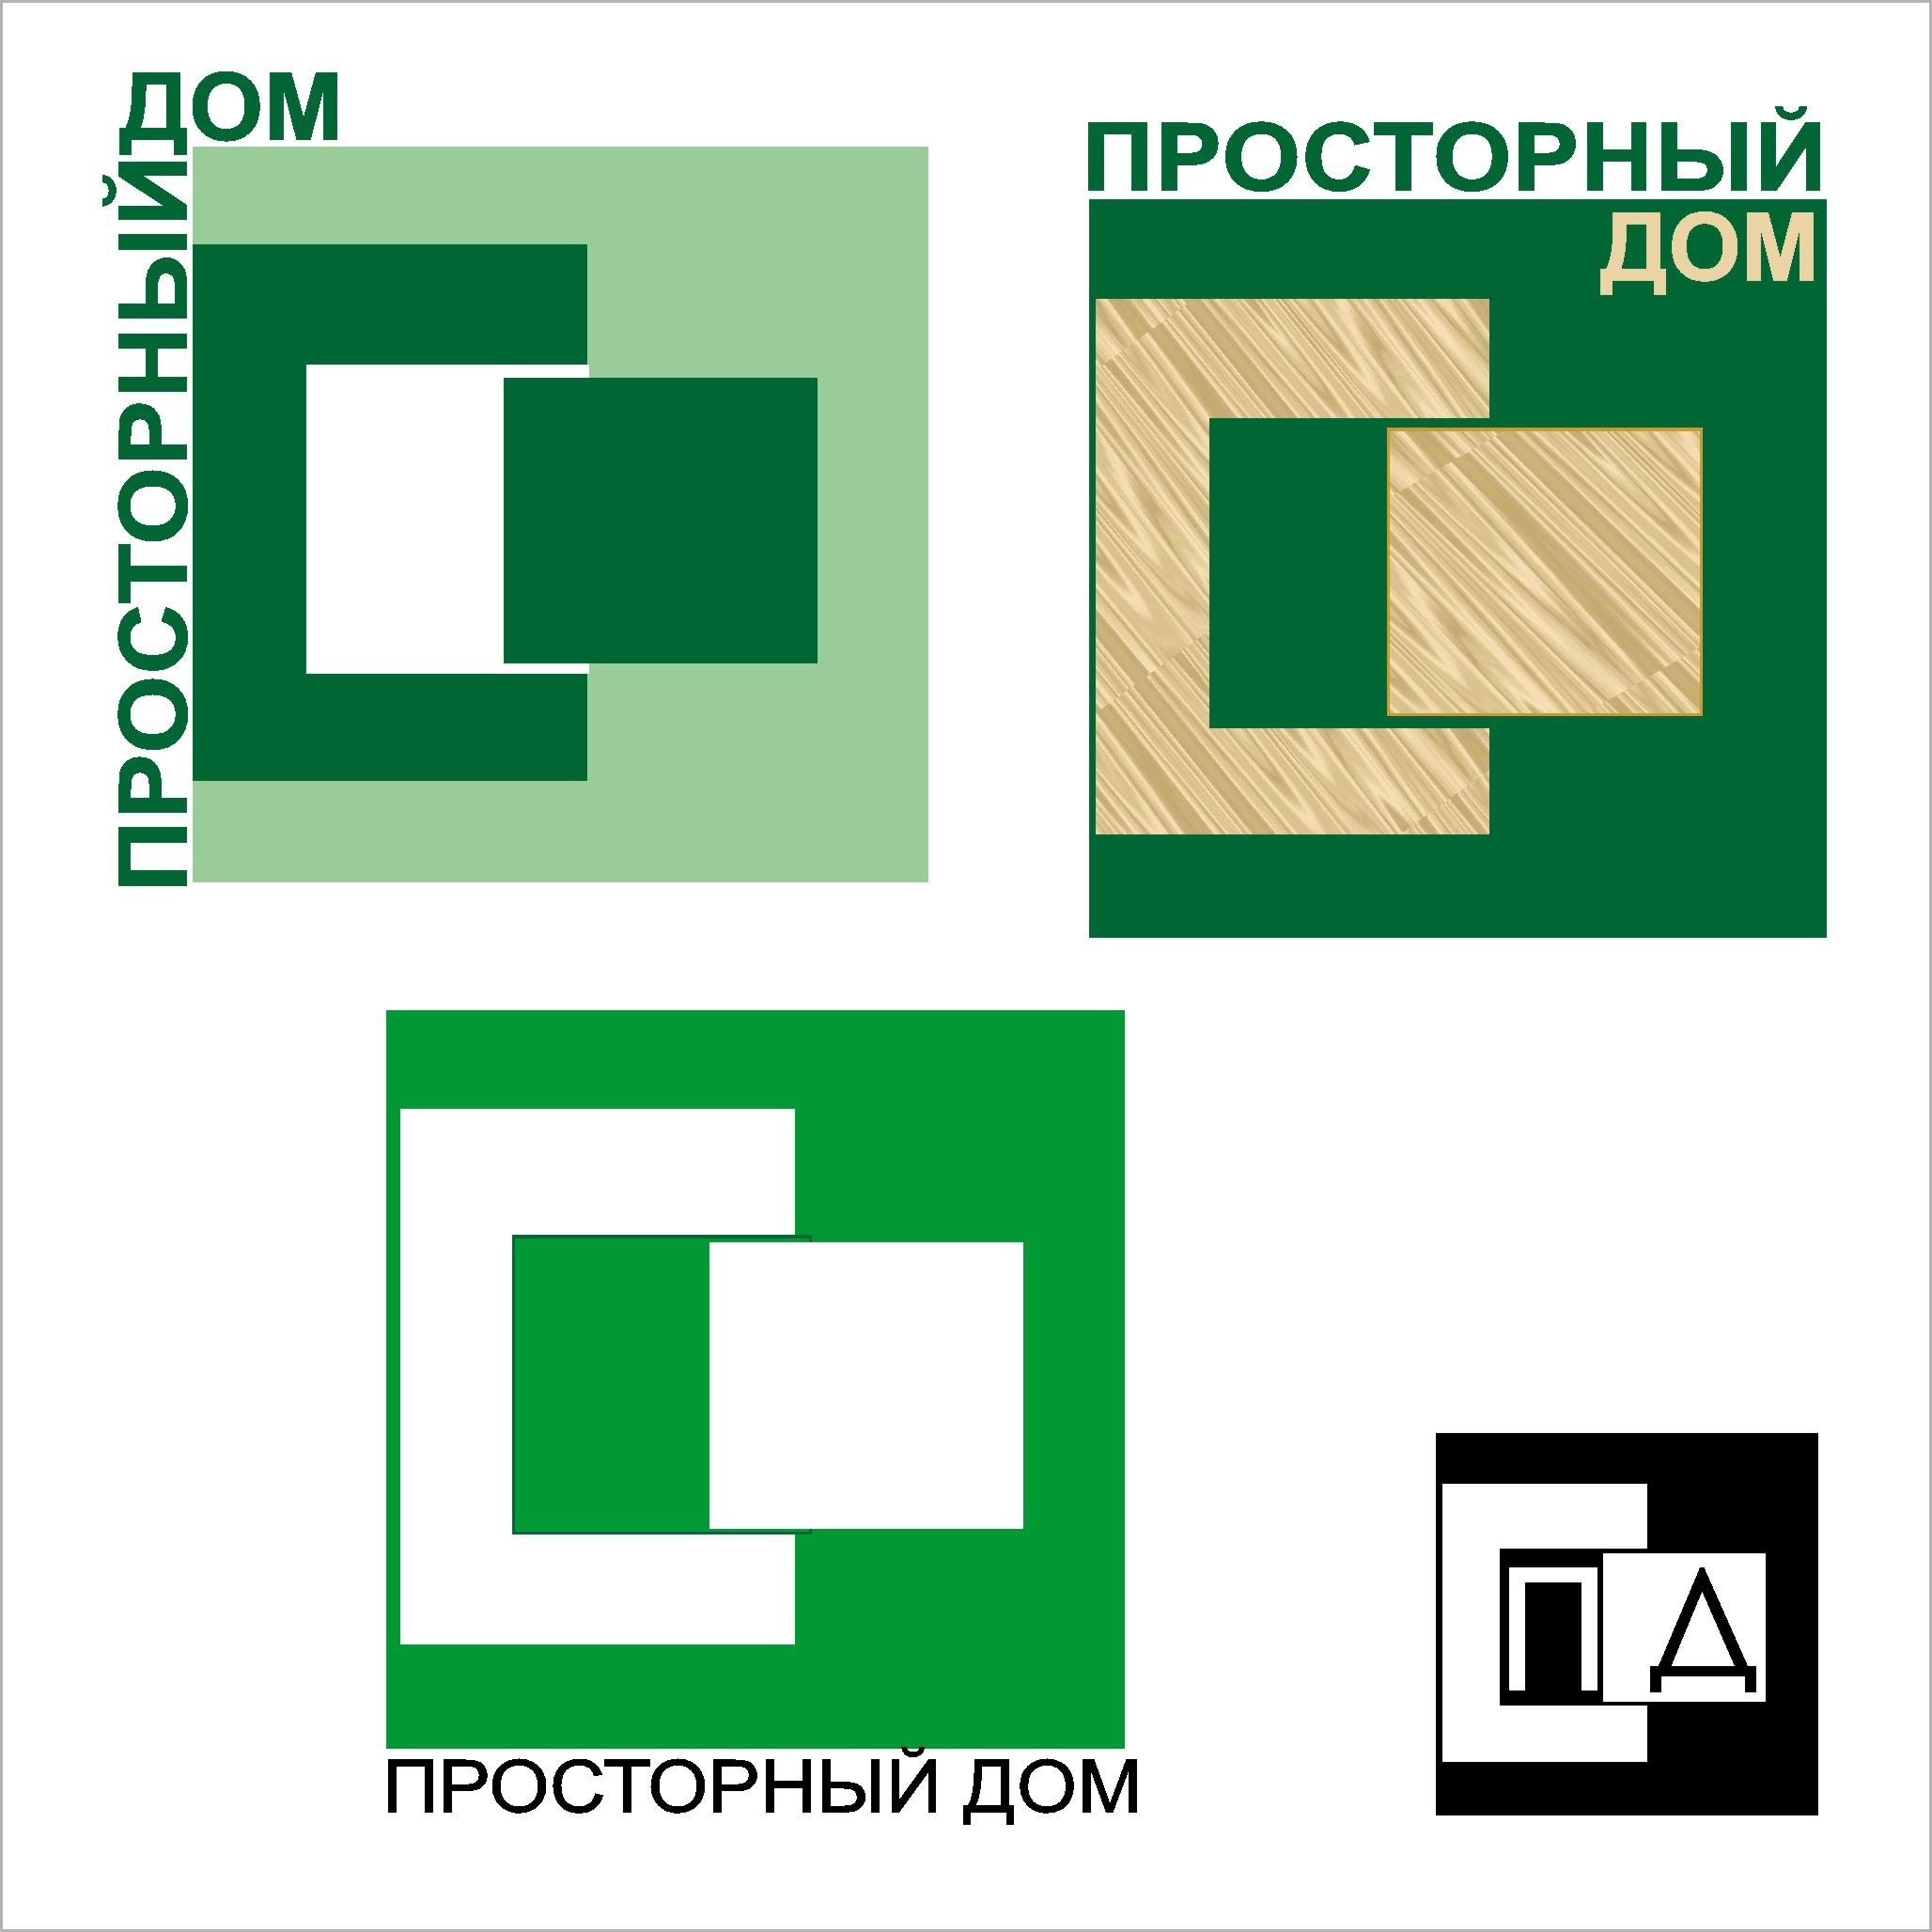 Логотип и фирменный стиль для компании по шкафам-купе фото f_1435b6ad5ae57d25.jpg